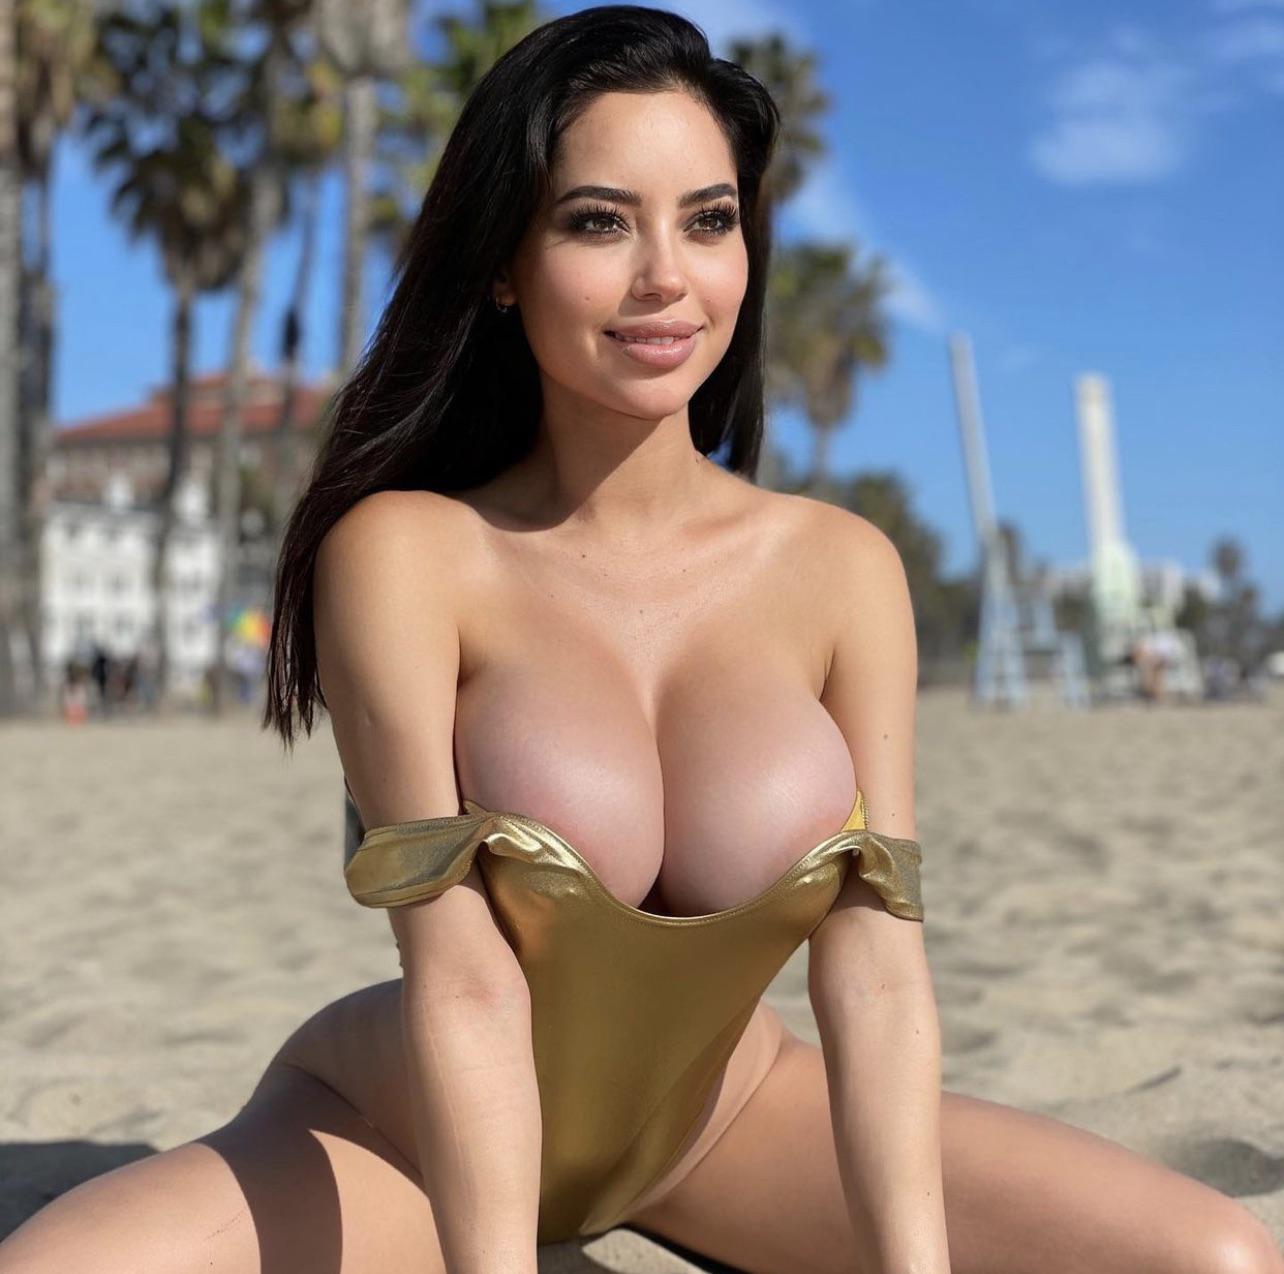 Nude yotta Marisol